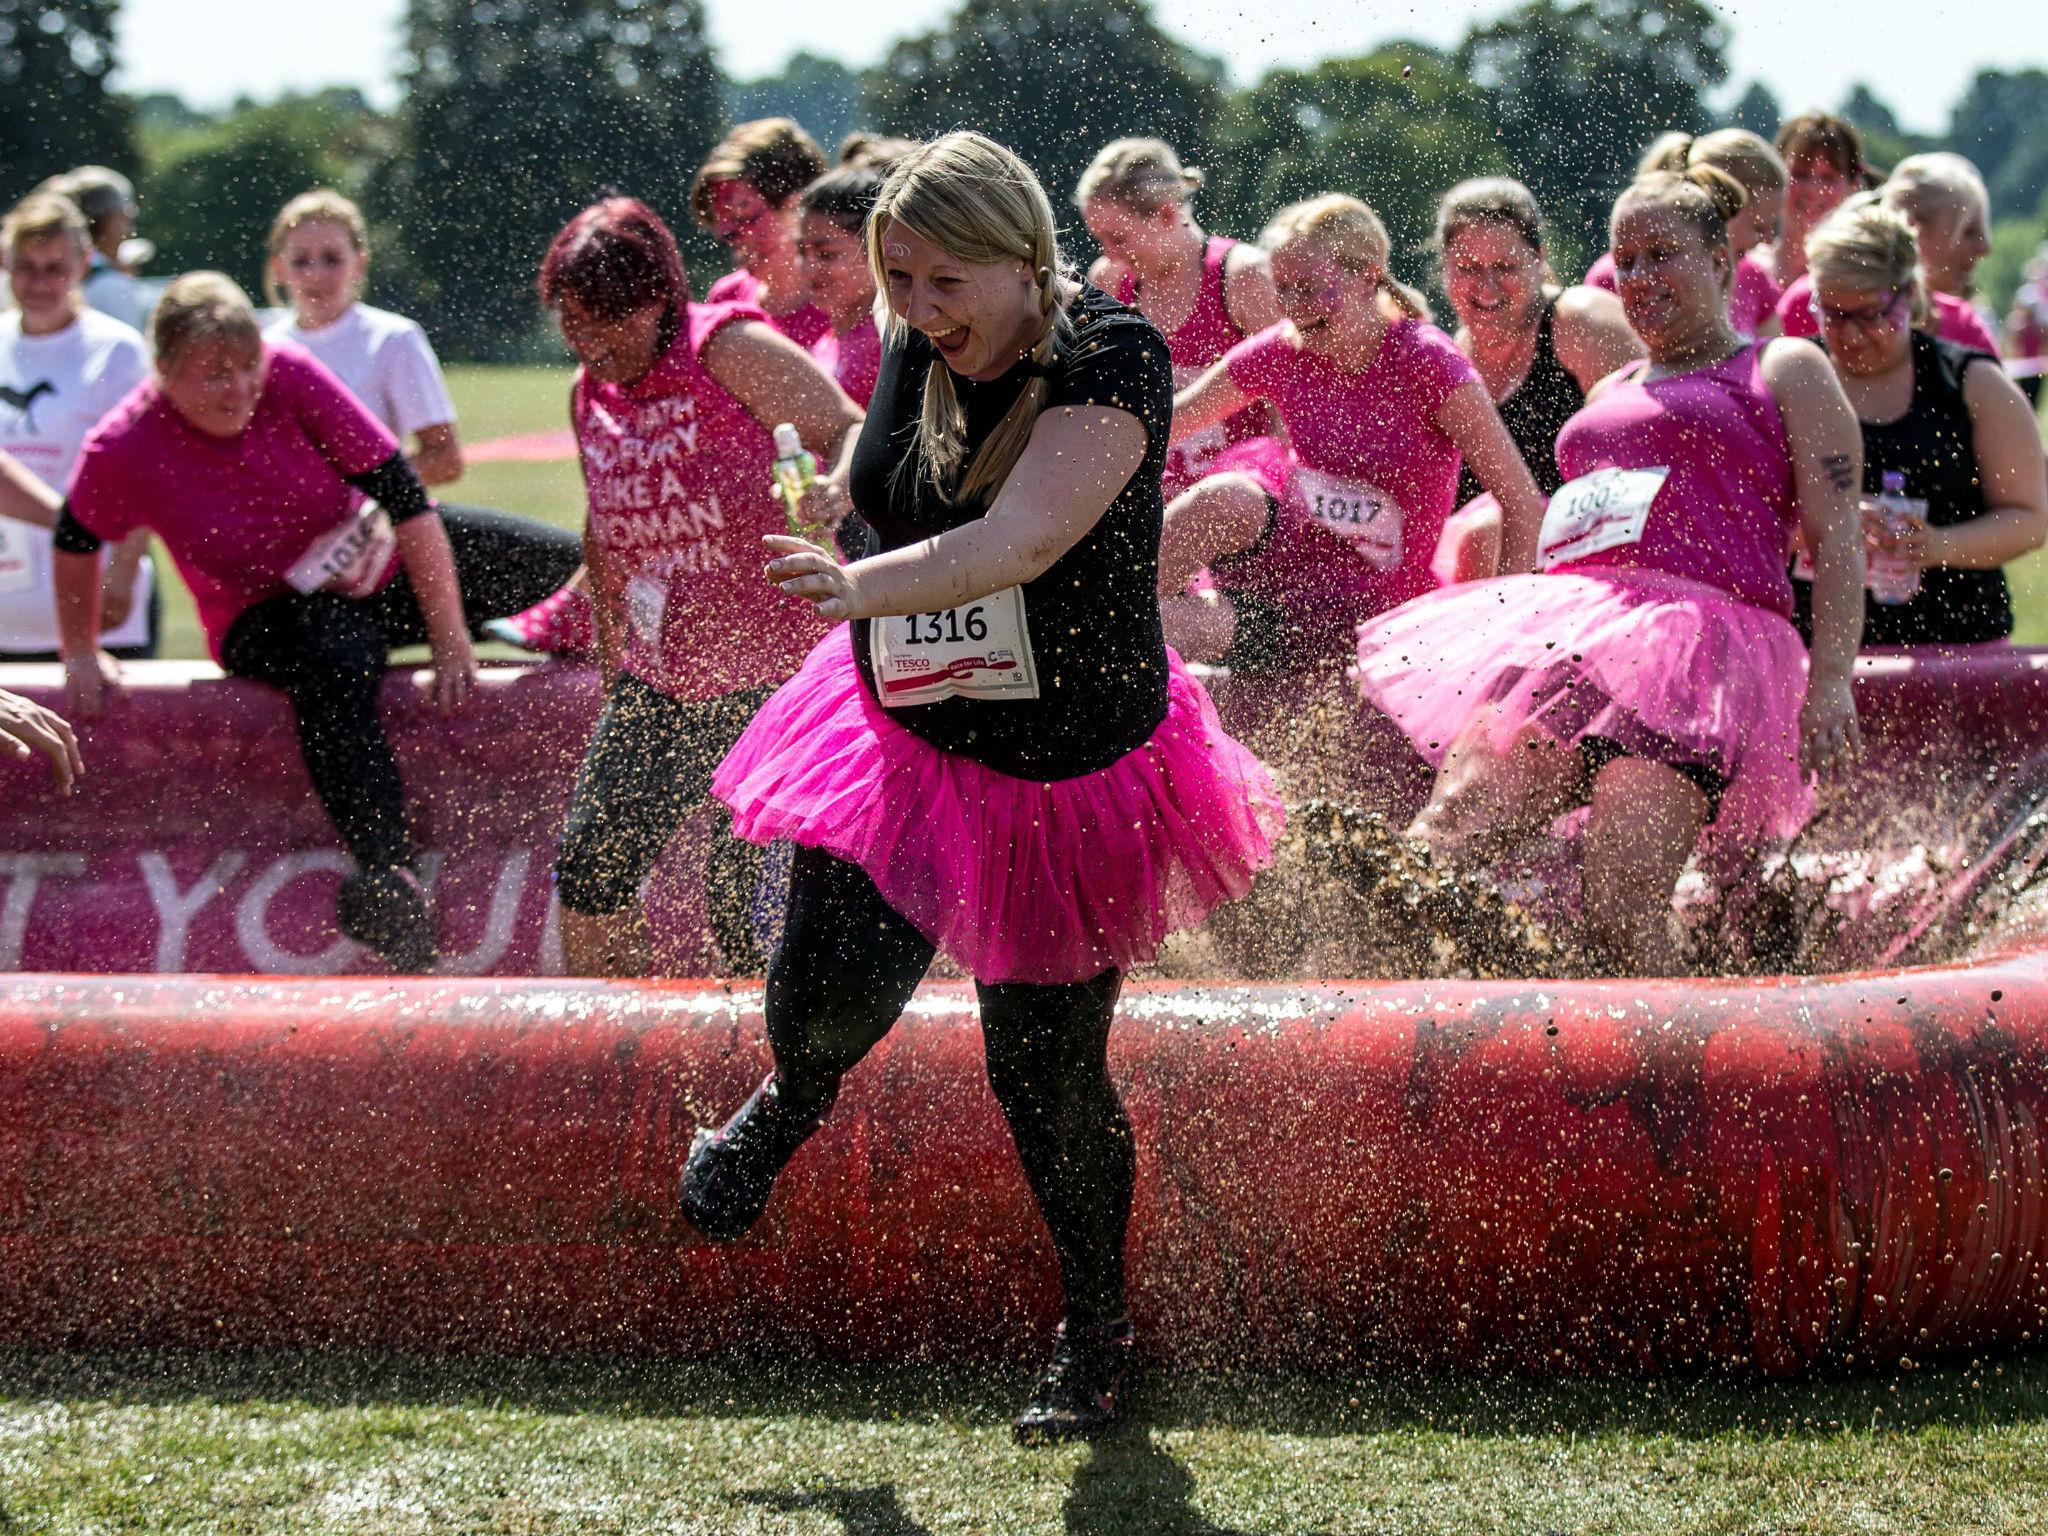 Run, splash and slide in Cancer Research UK's Pretty Muddy